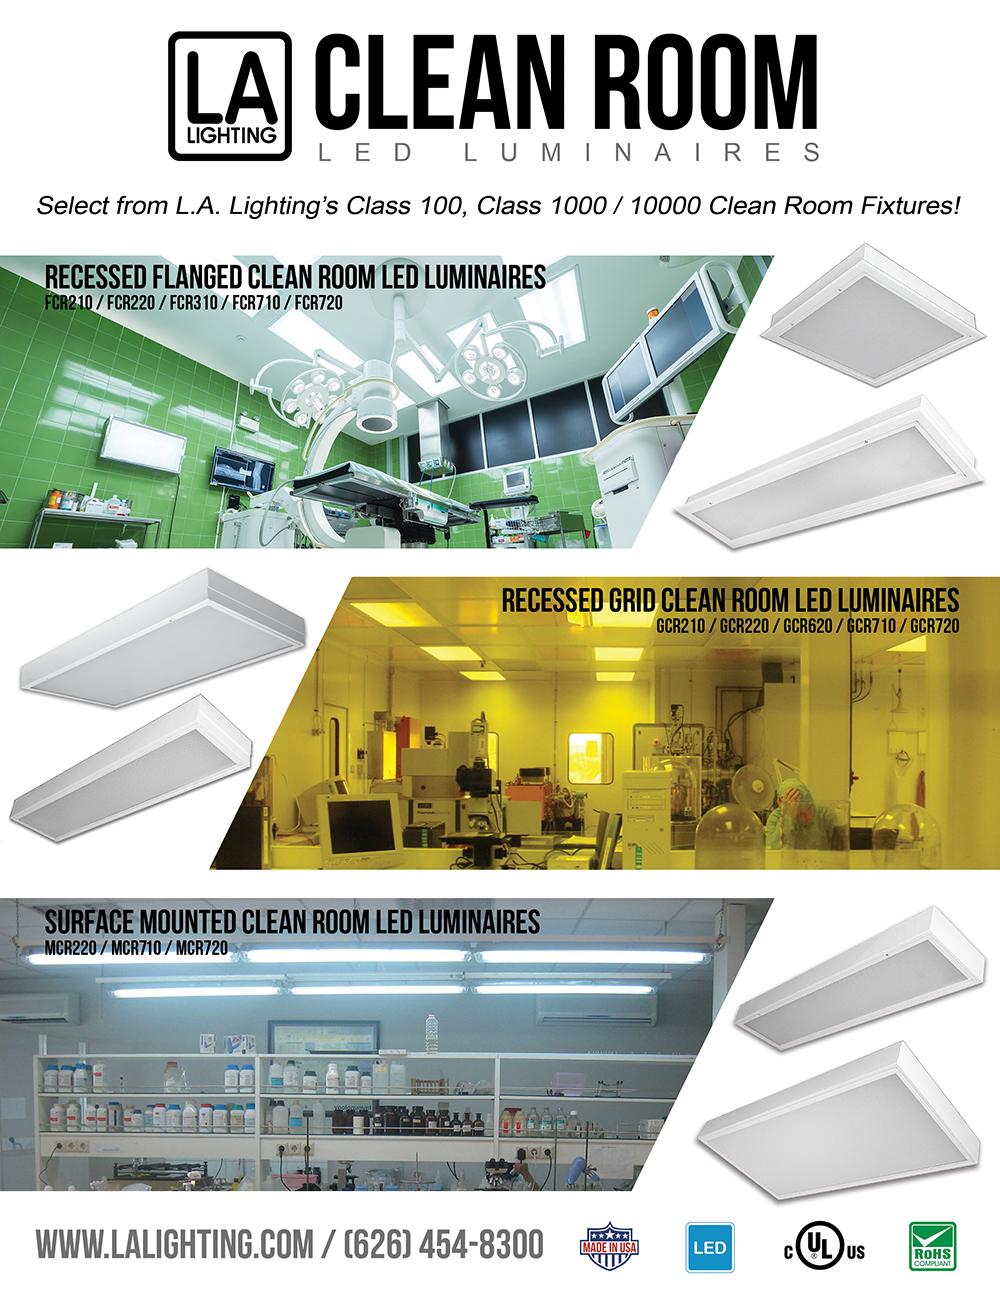 Led luminaires product promos la lighting clean room promo arubaitofo Gallery